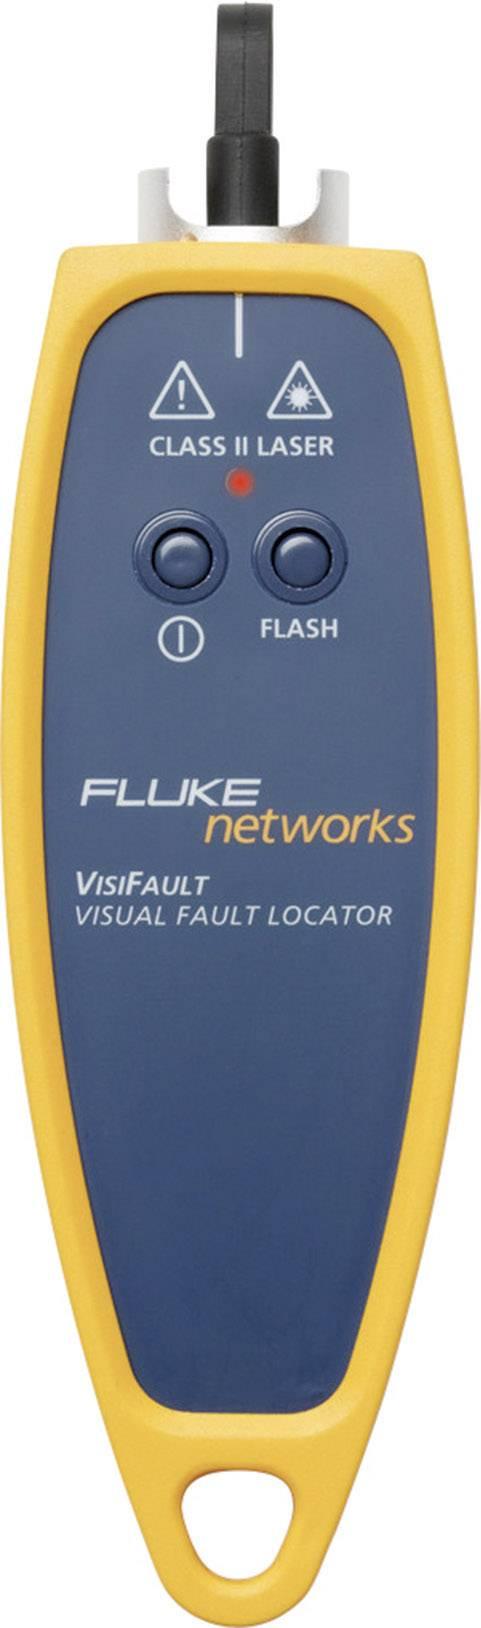 Vizuálny chybový lokátor Fluke Networks VISIFAULT Fault Locator